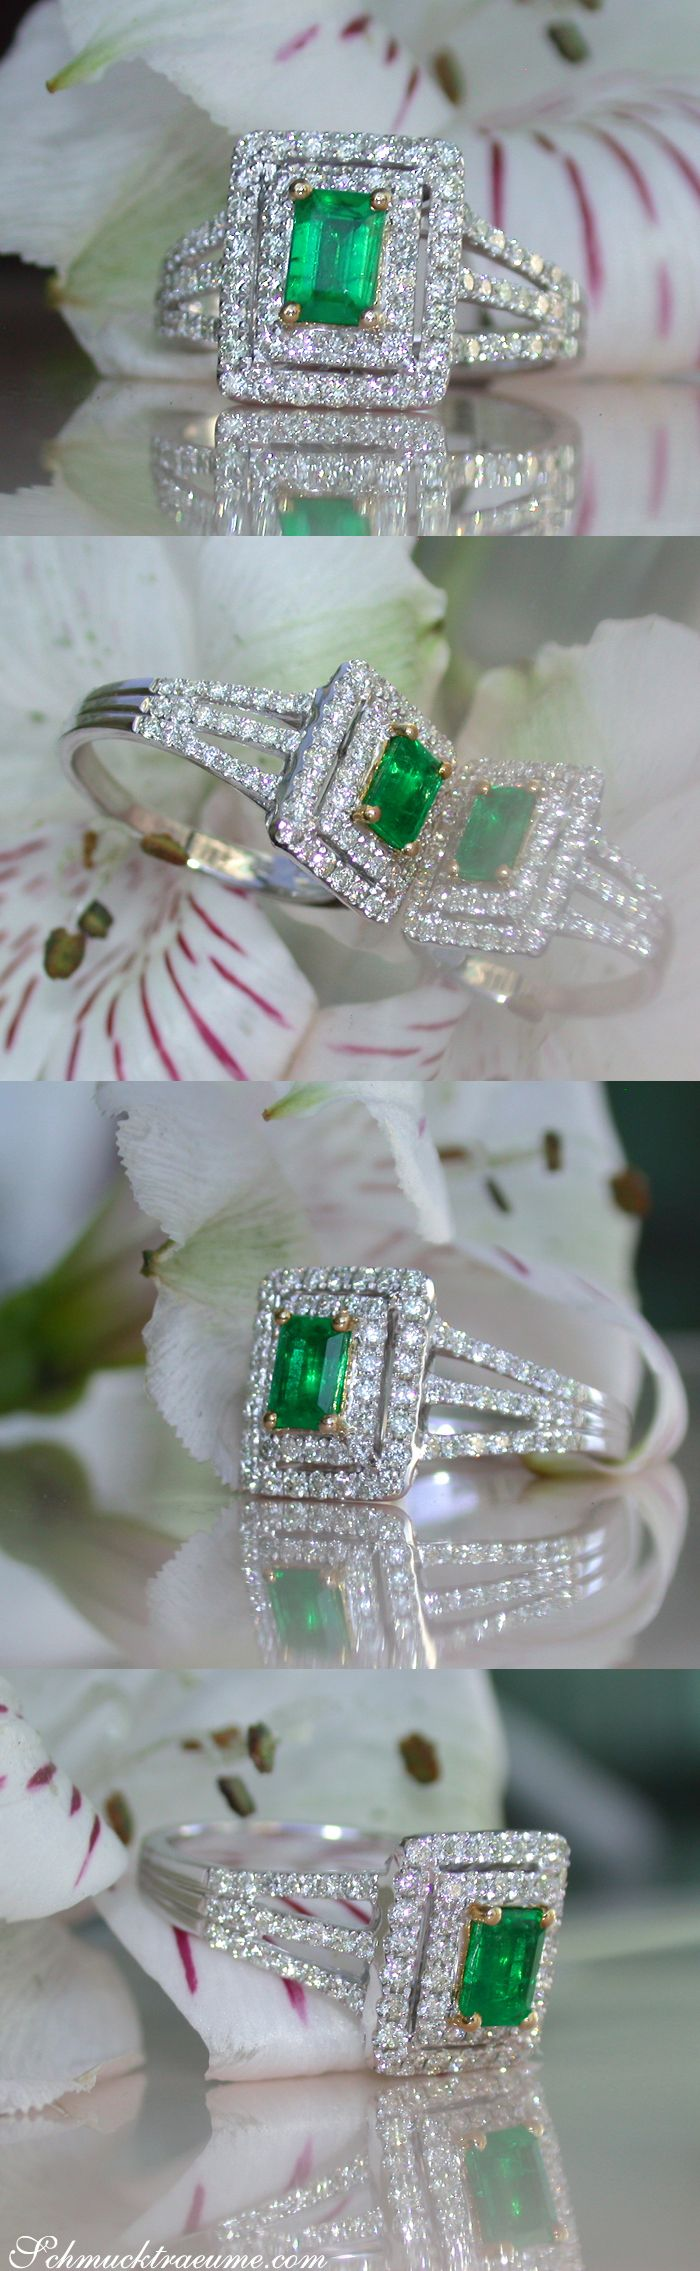 Ausgesuchter Kolumbianischer Smaragd Ring mit Brillanten | Precious Columbian Emerald Ring with Diamonds | Explore: Schmucktraeume.com | Like: https://www.facebook.com/pages/Noble-Juwelen/150871984924926